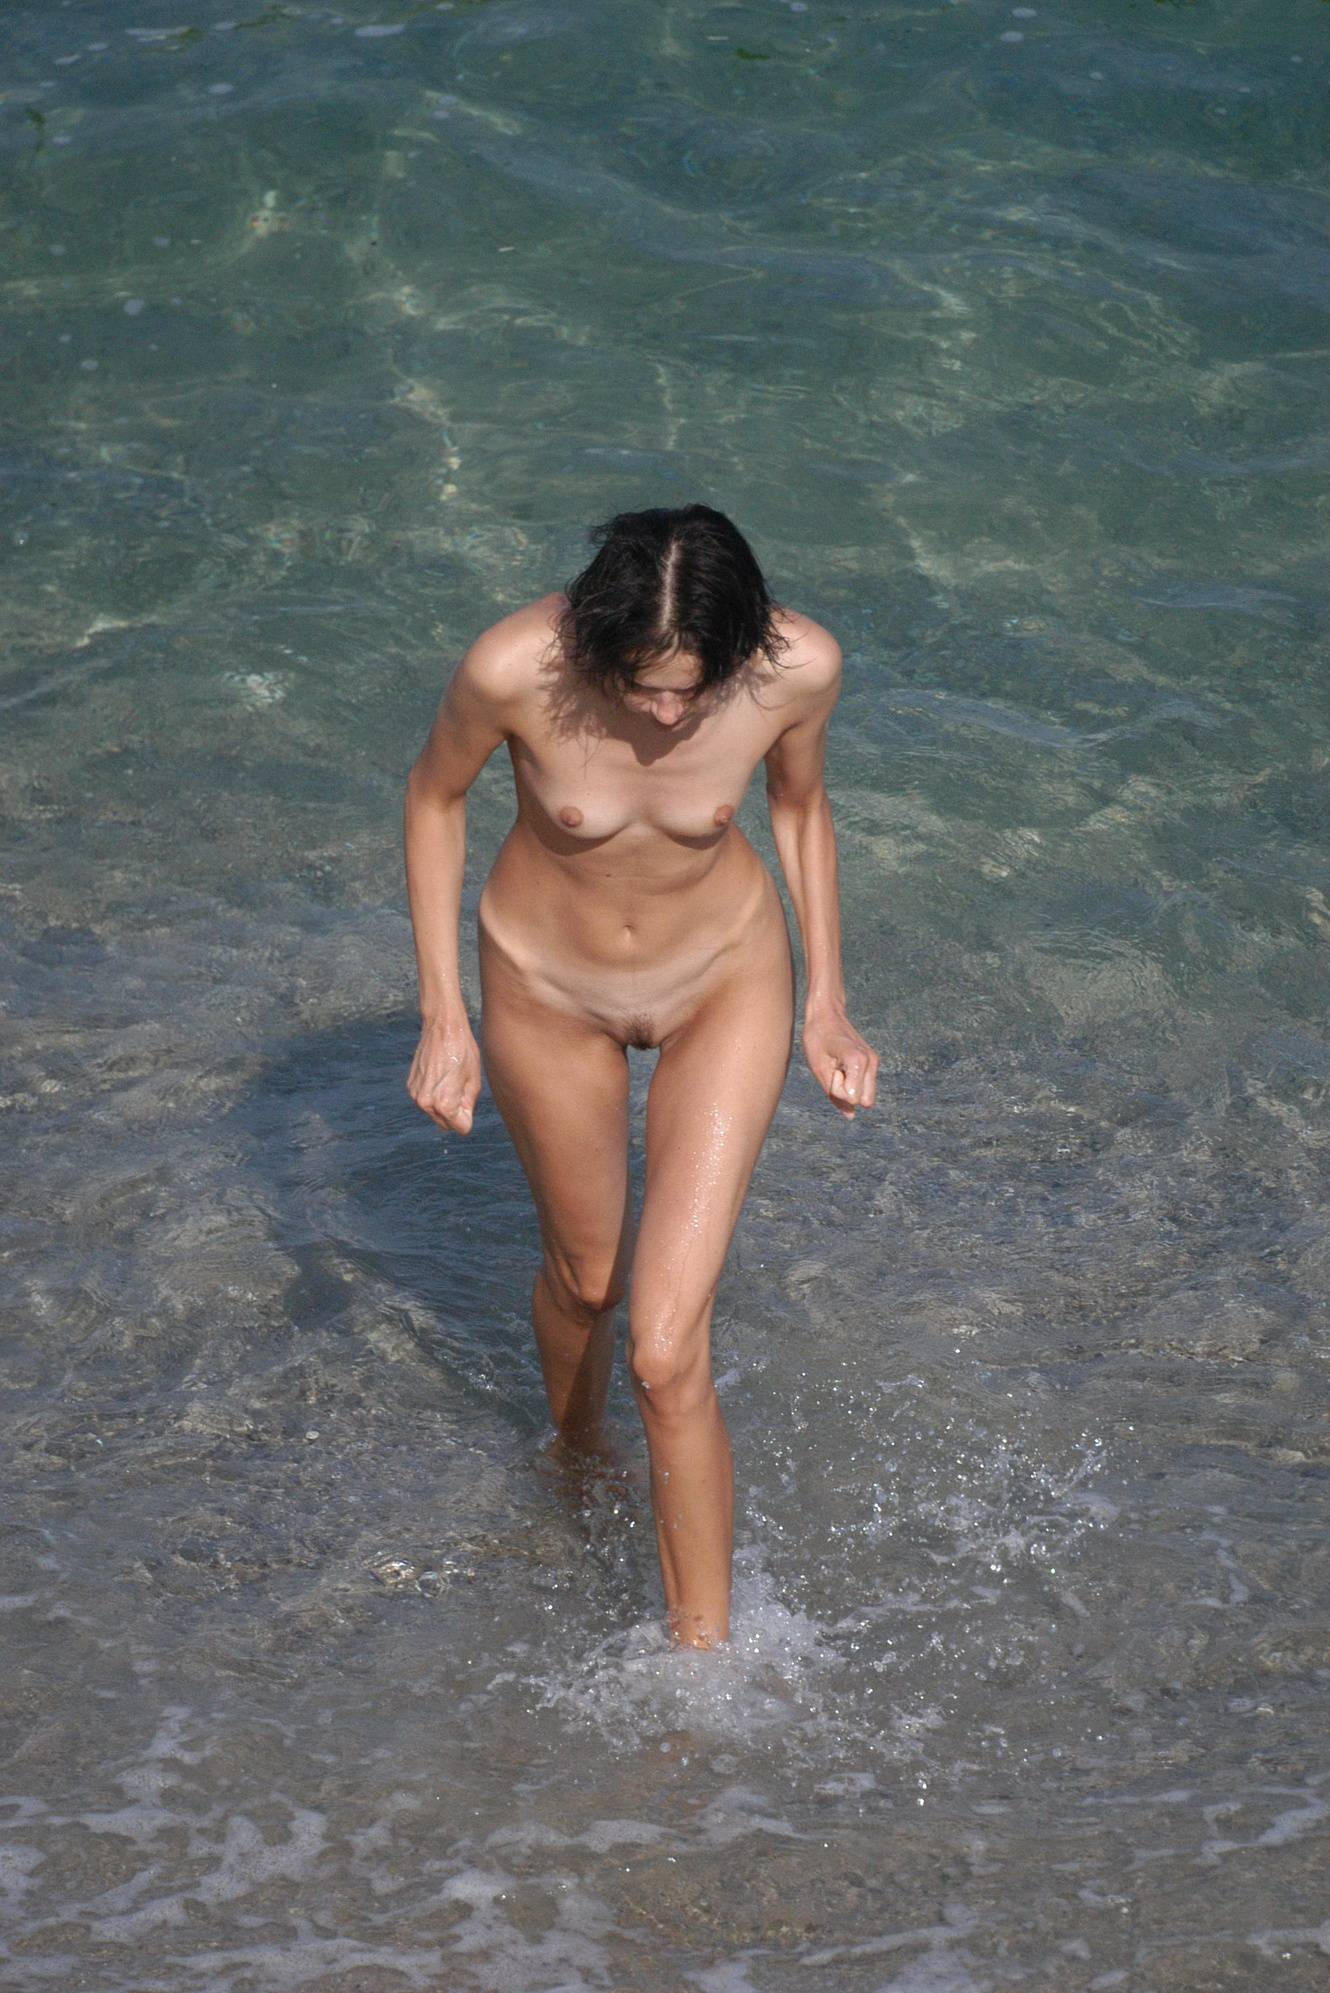 Verna Thin Nudist Girl - 1